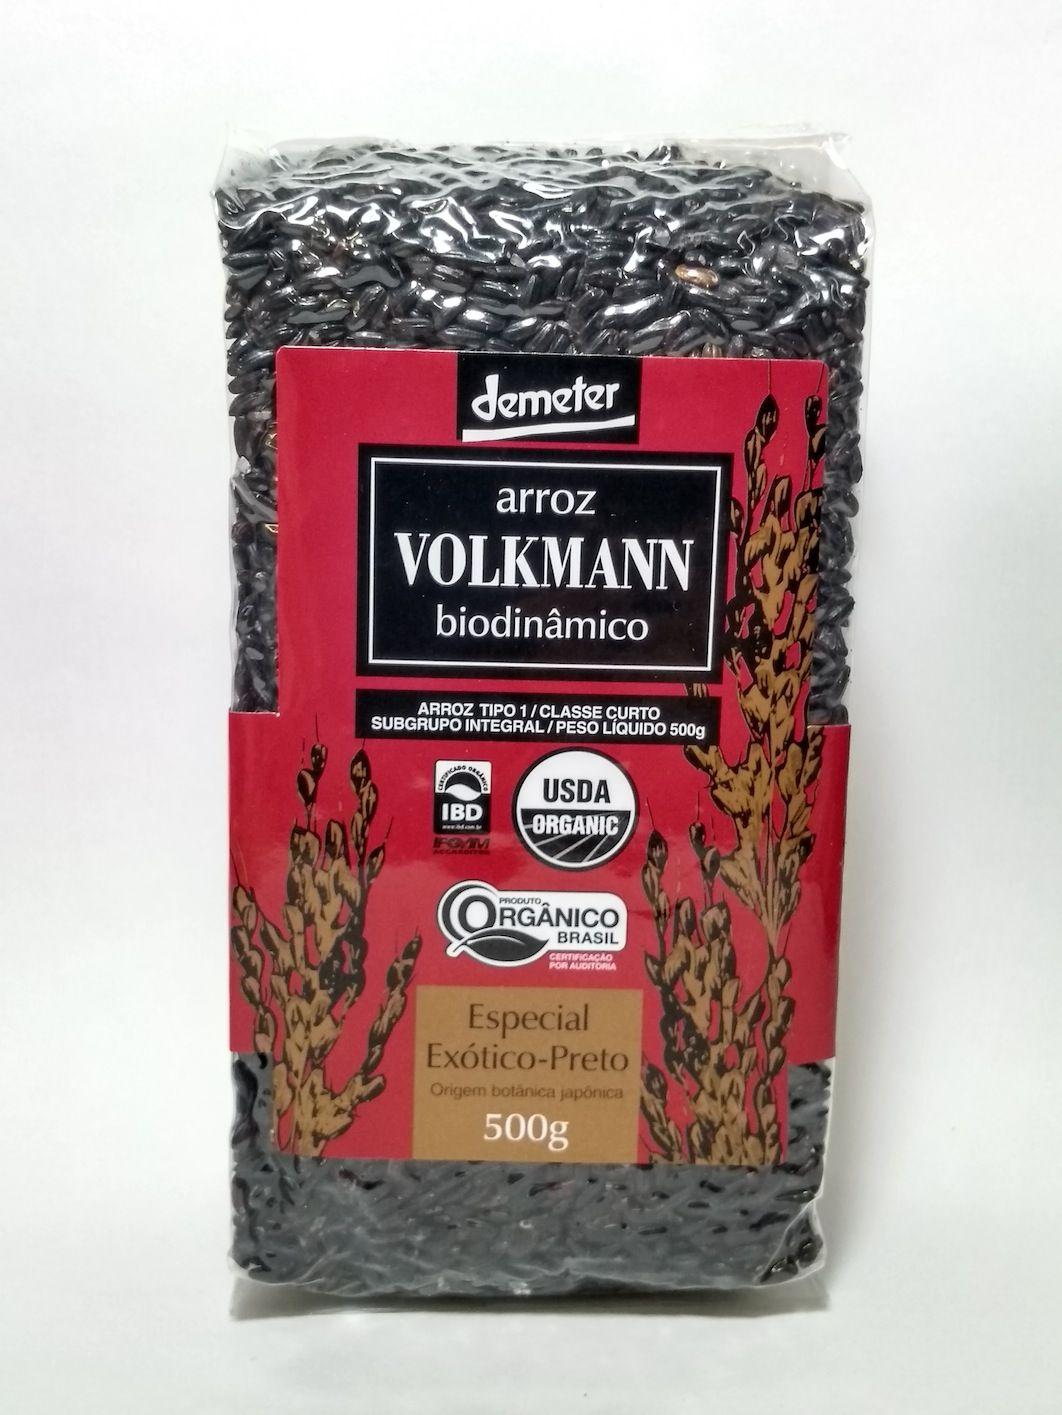 Arroz especial exótico-preto biodinâmico, 500g – Volkmann